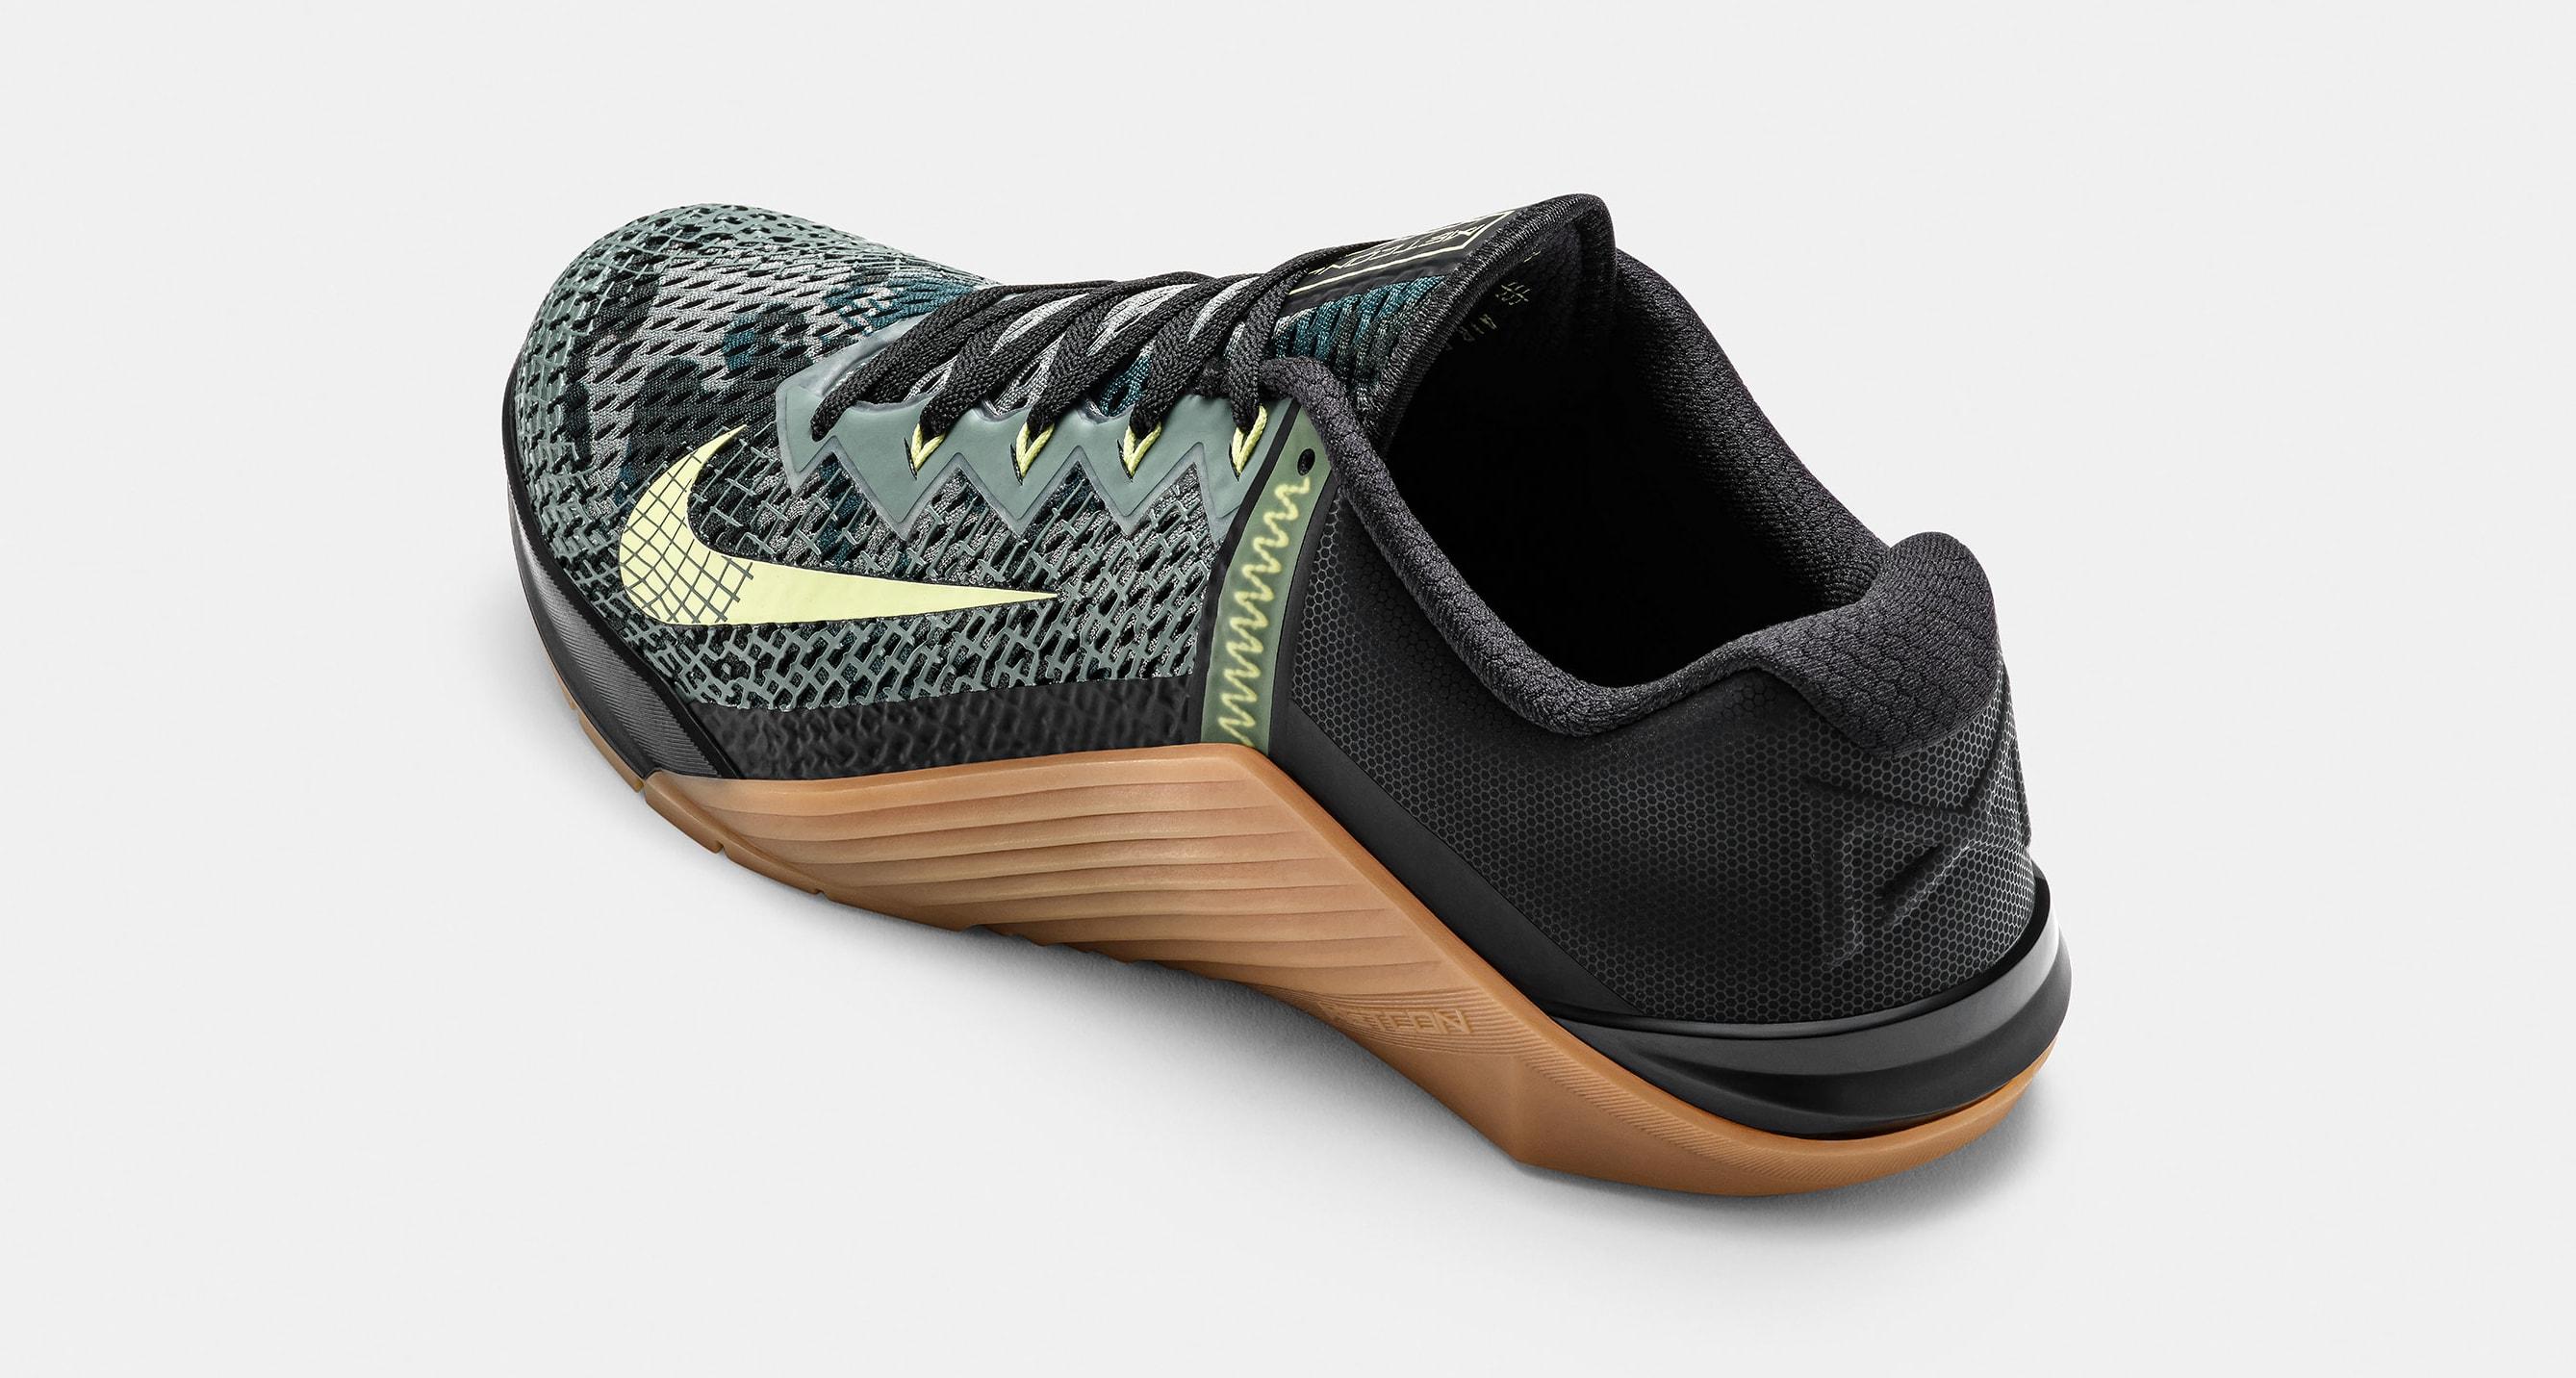 Nike MetCon 6 Heel